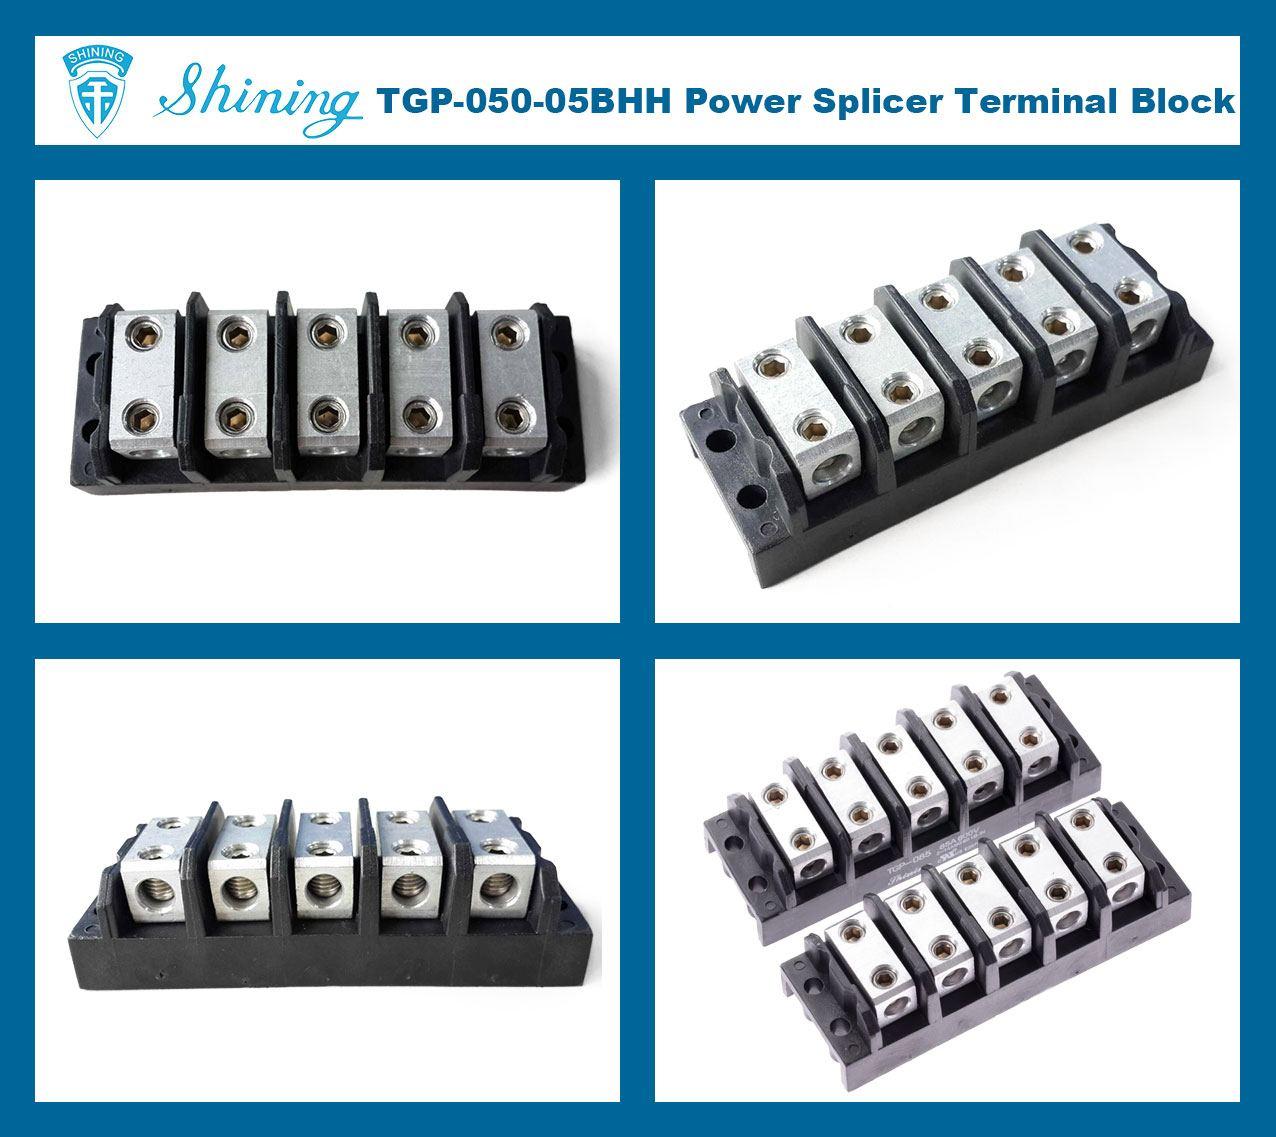 TGP-050-05BHH 600V 50A 5 Way Power Splicer Terminal Block